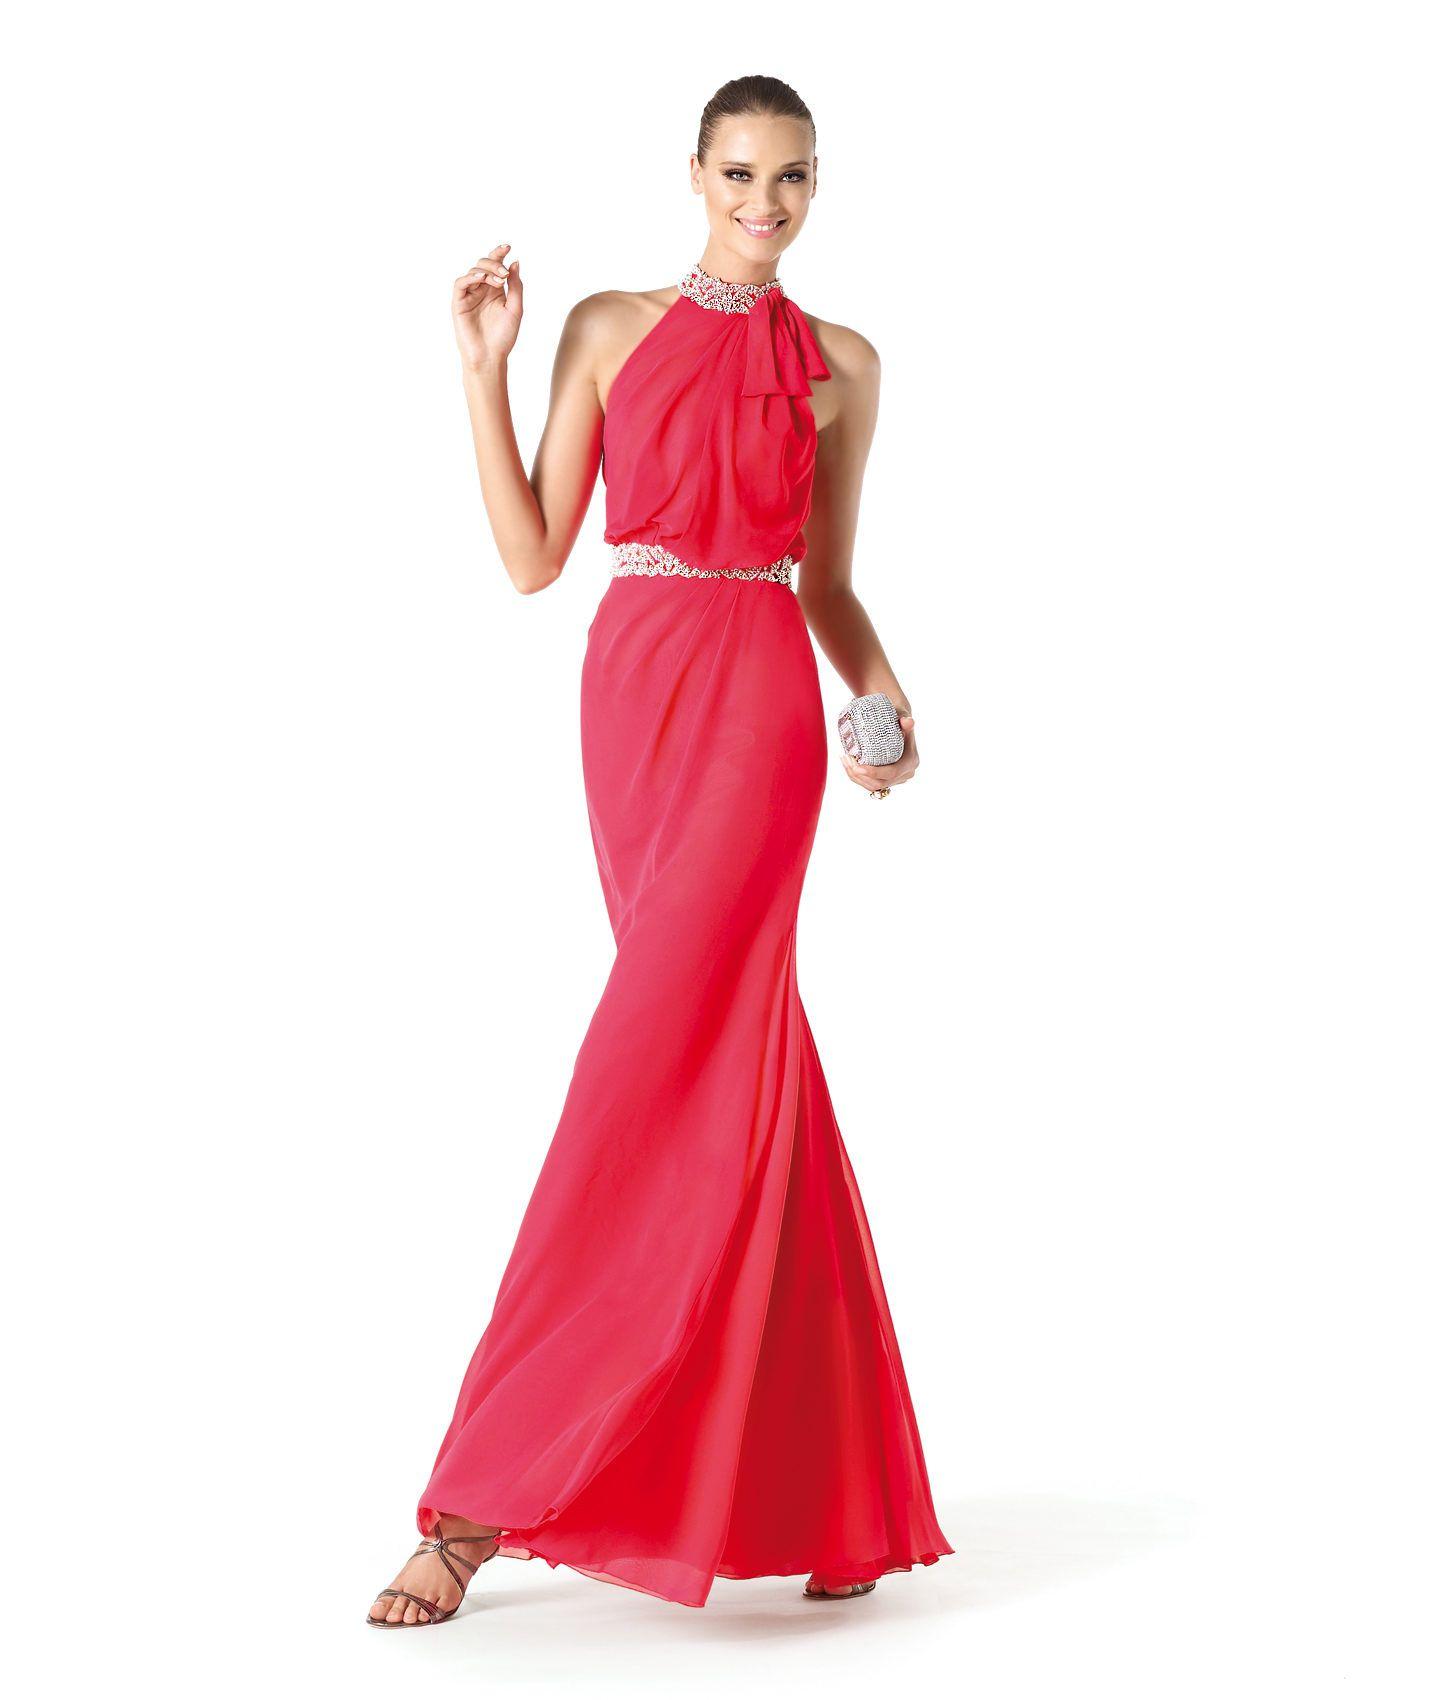 pronovias cerimonia 2014 | cocktailkleid, kleider, rotes